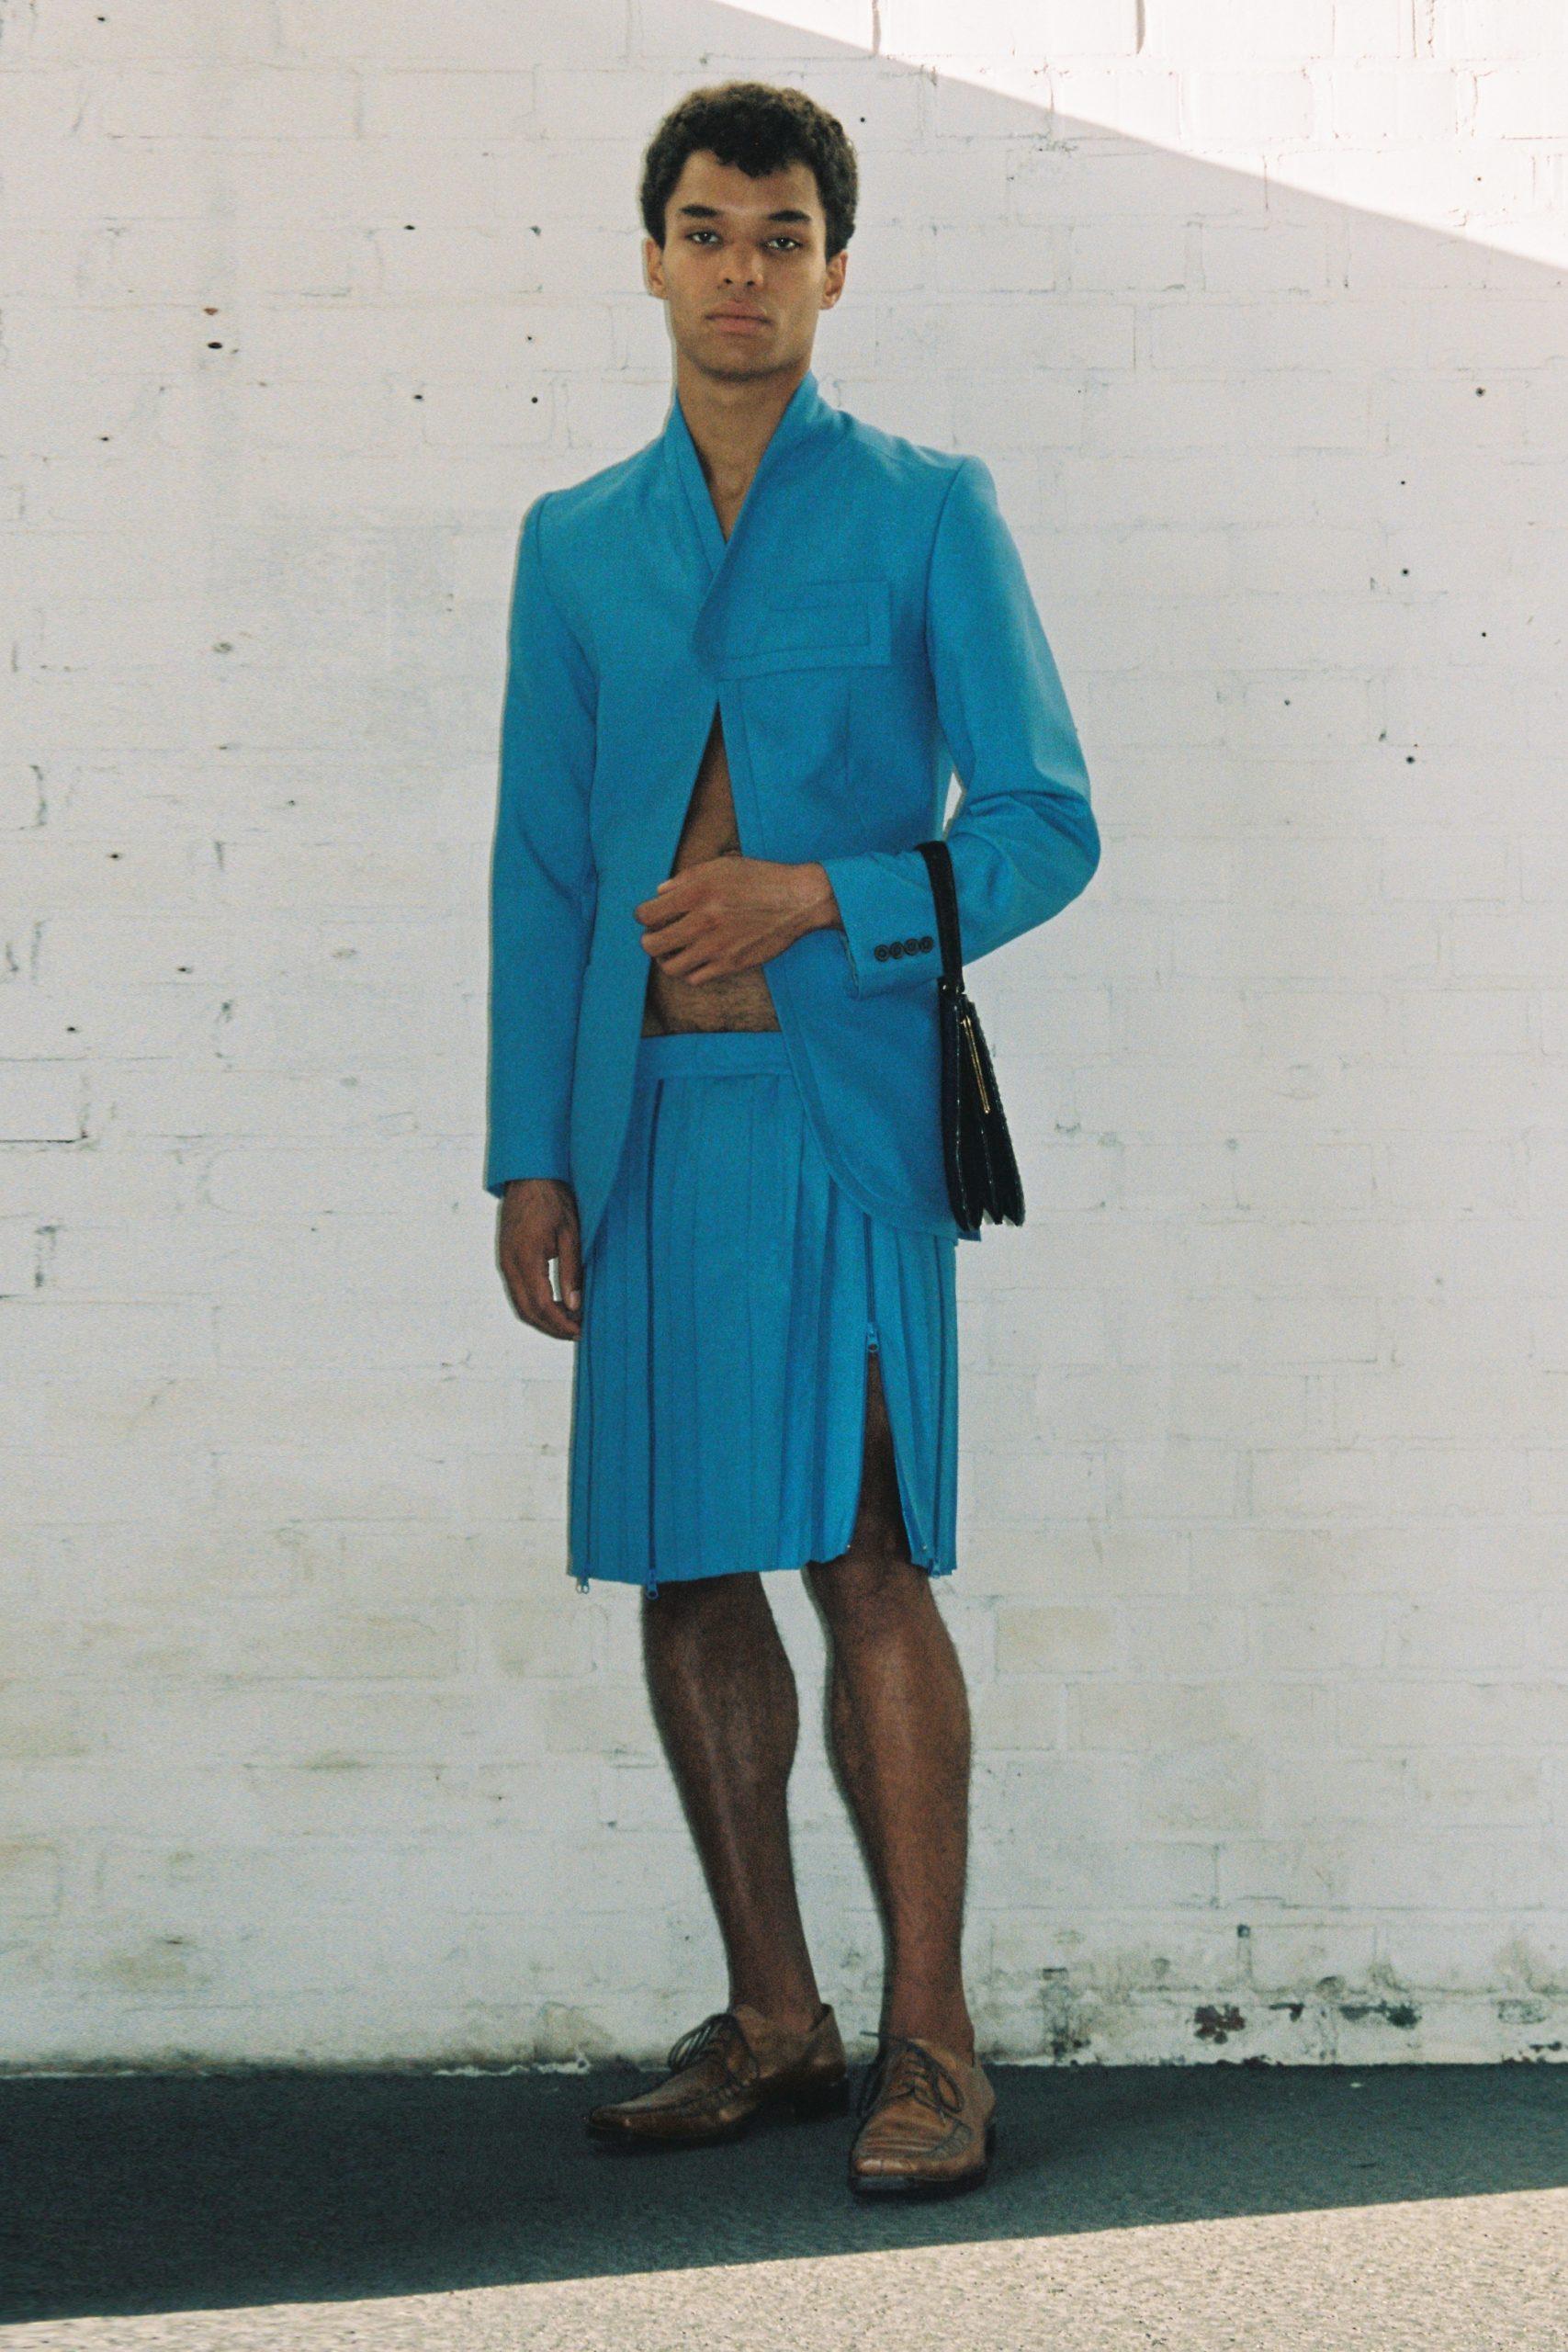 SITUATIONIST SS 21 LOOK 7 scaled 1 #fashion «Mercedes-Benz Fashion week Tbilisi», George Keburia, MATÉRIEL, Situationist, Георгий Кебурия, Ираклий Русадзе, мода, София Чкония, Тико Паксашвили, фэшн